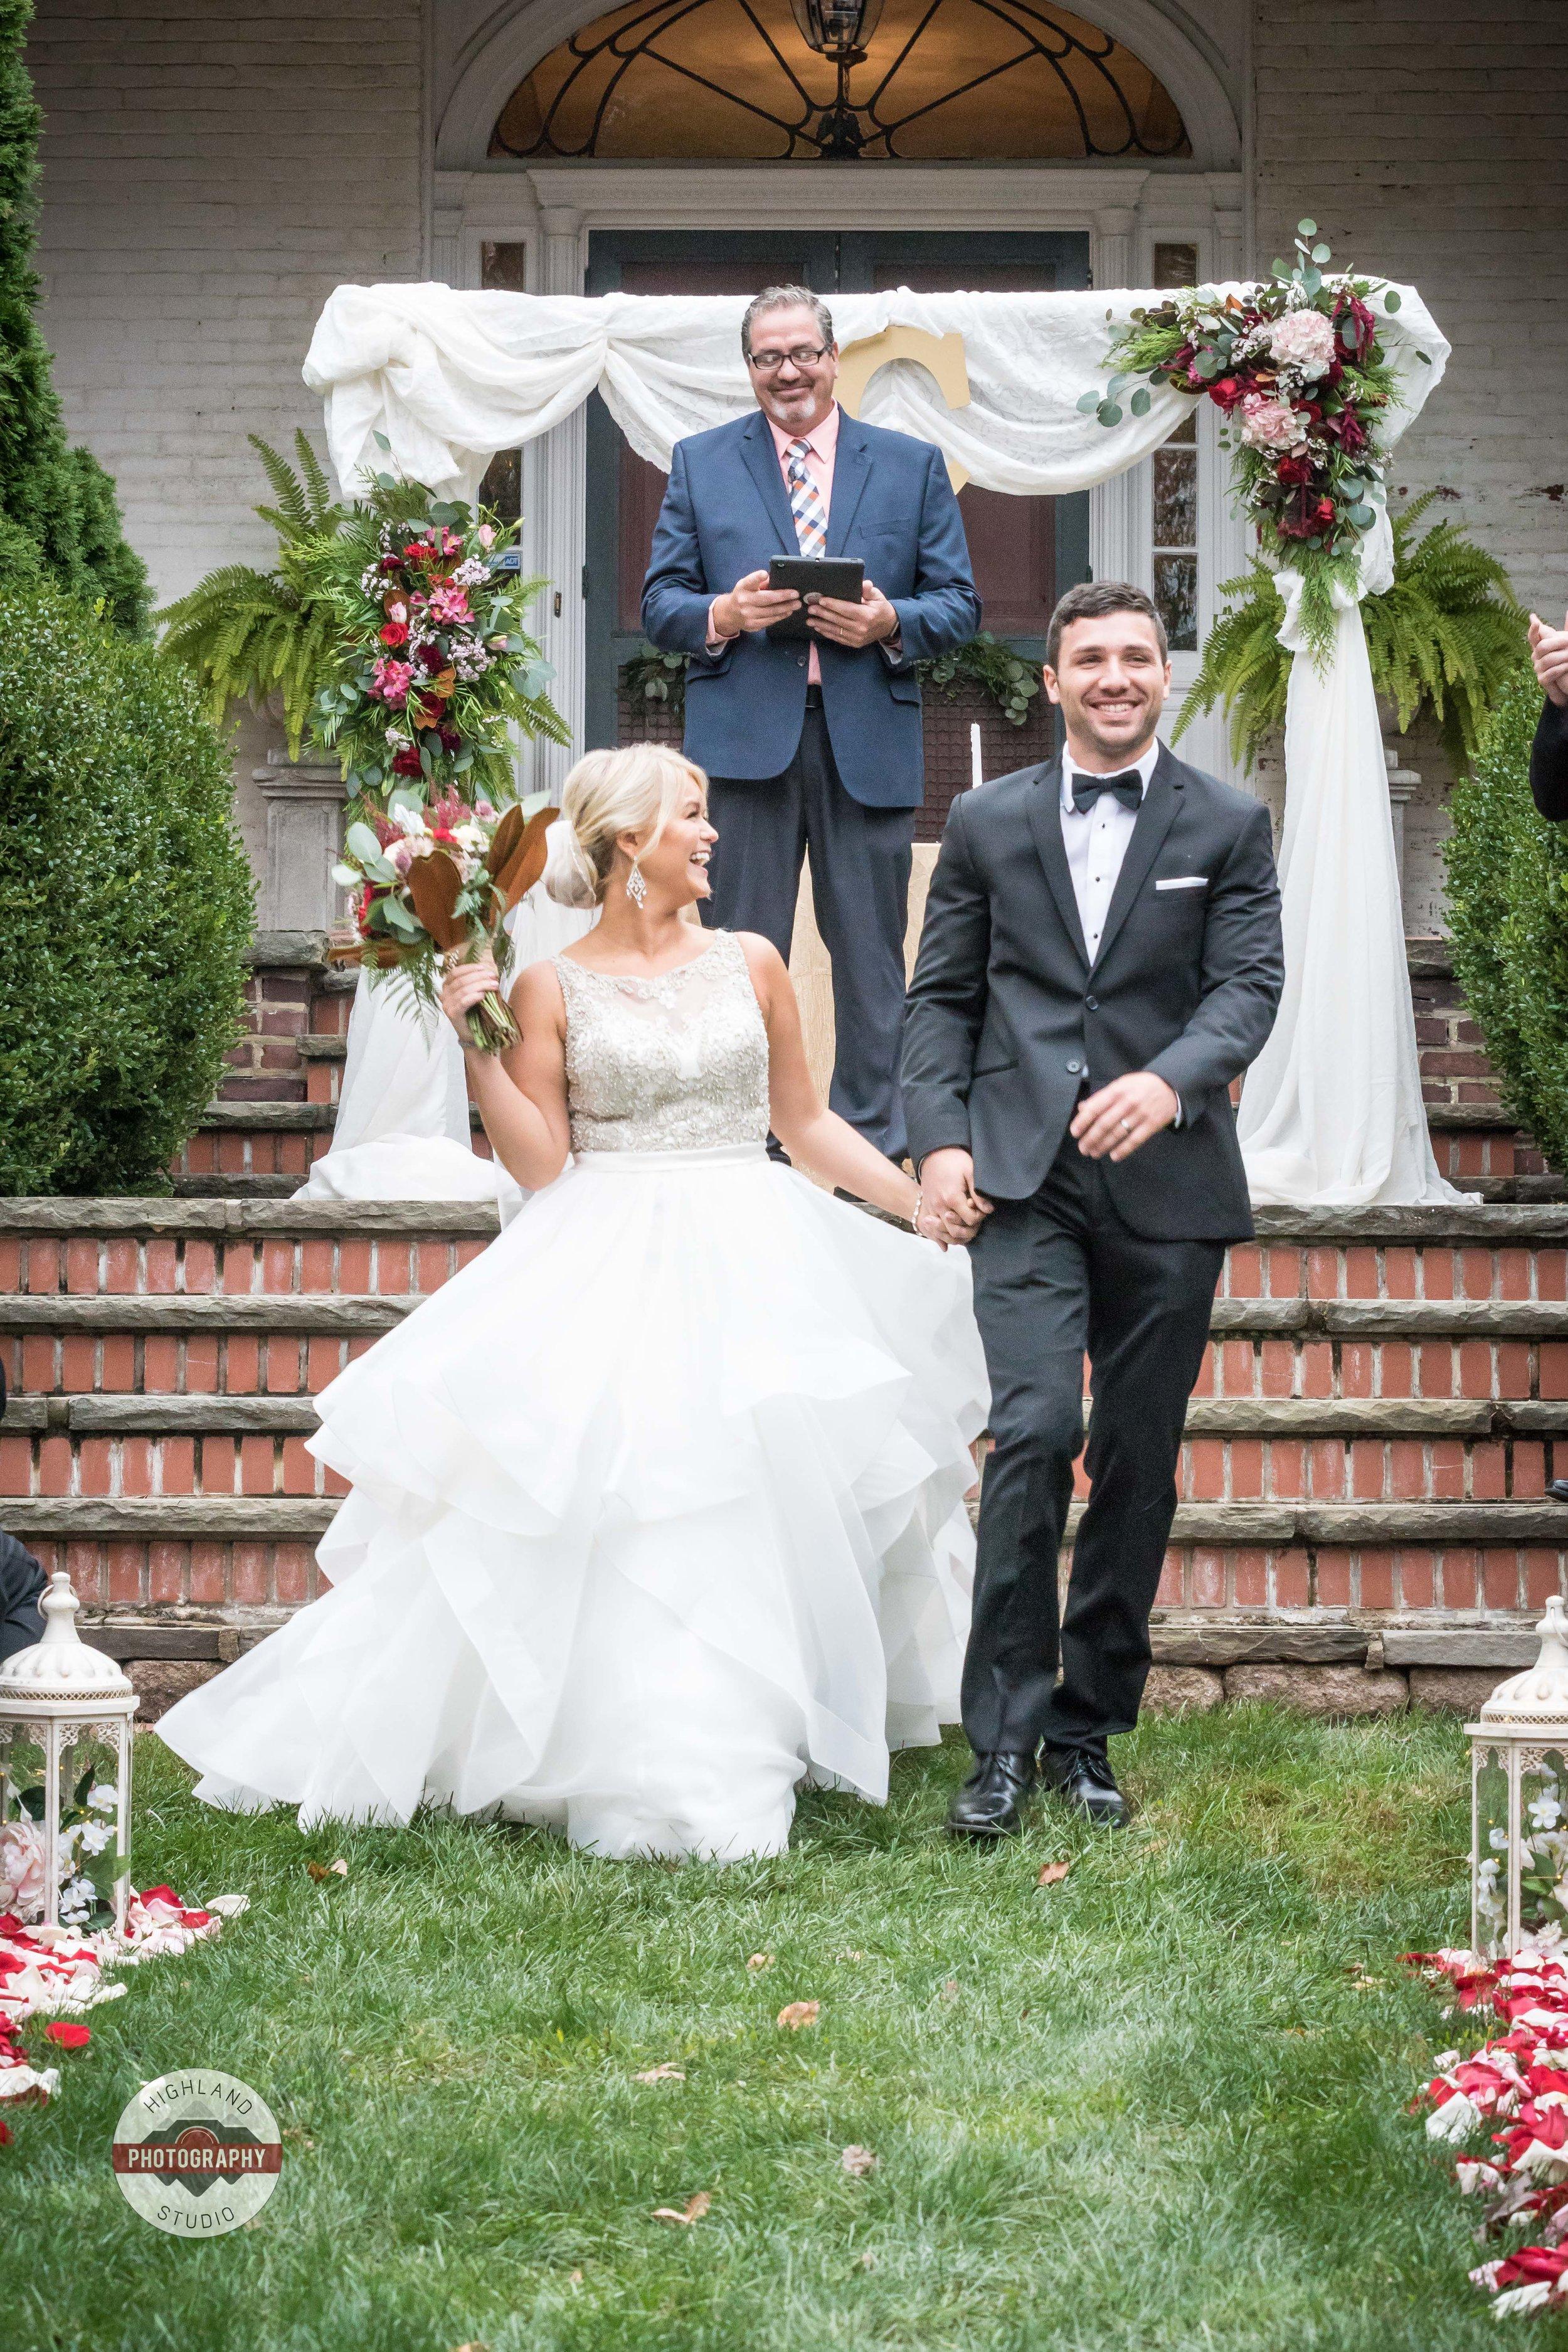 Highland Photography Studio-Wedding Photography-25.jpg